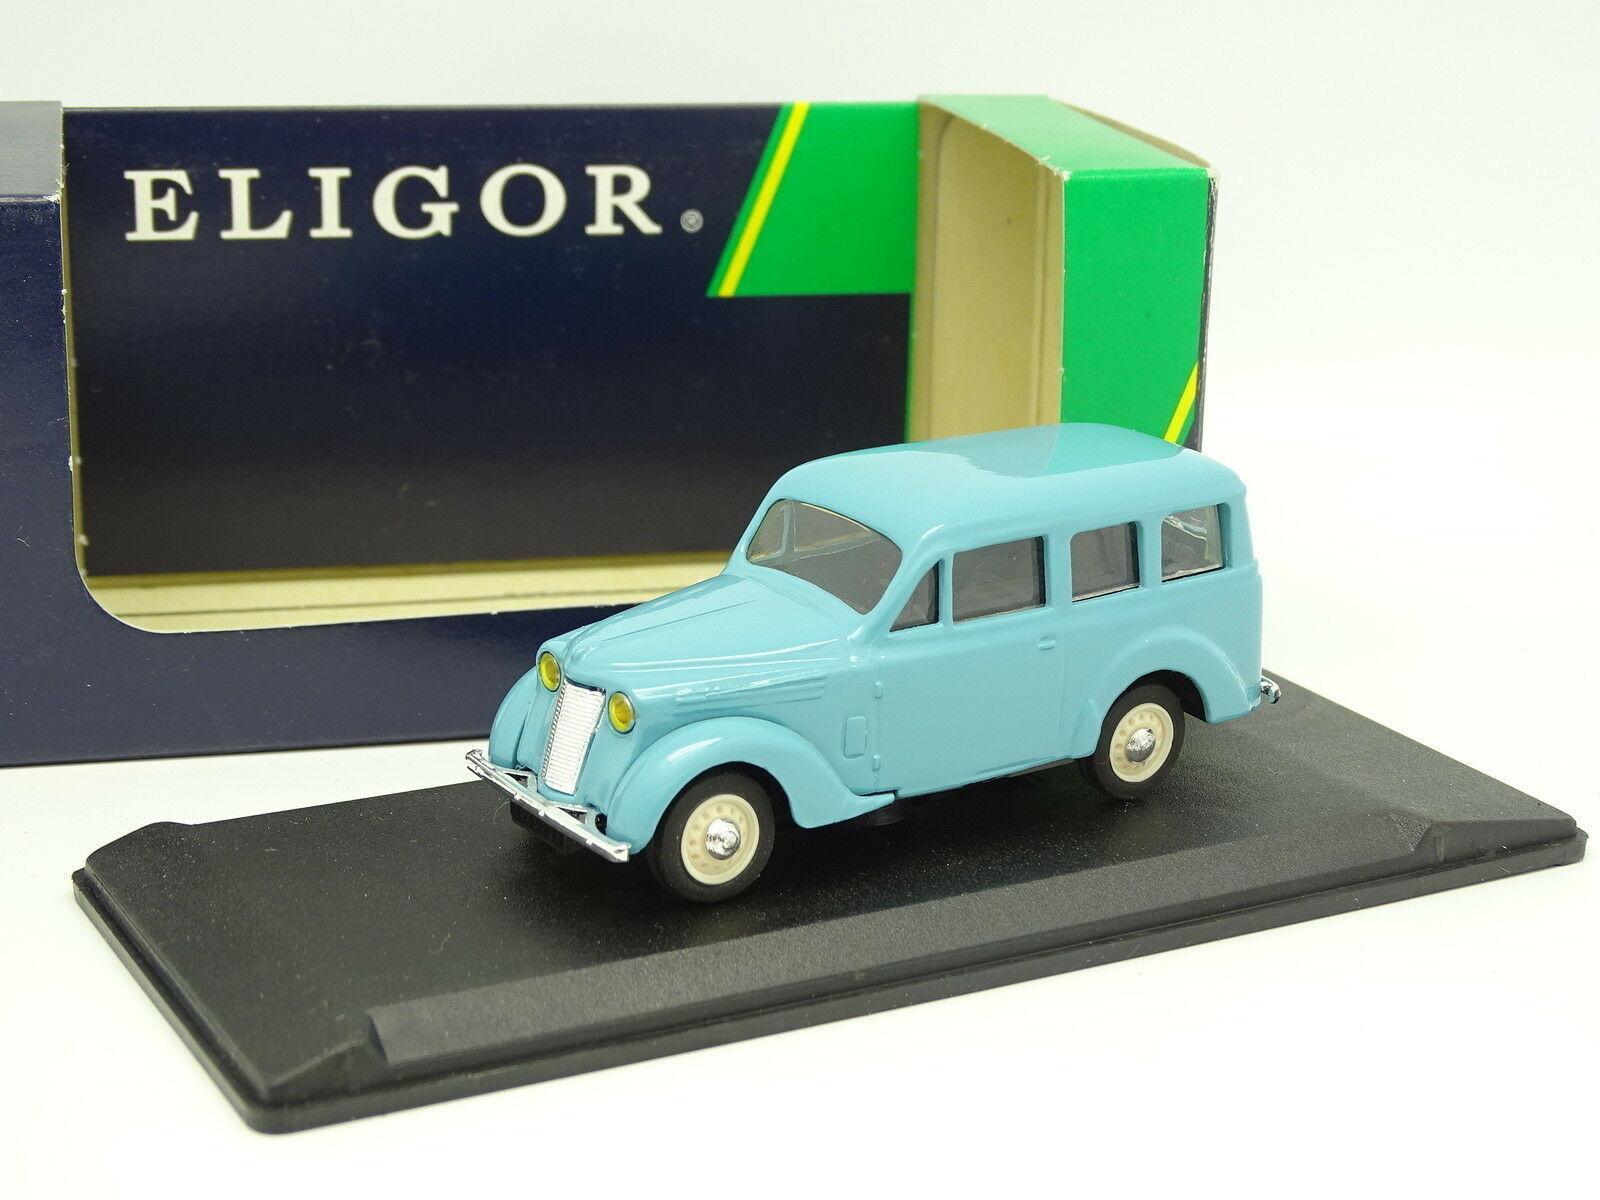 Eligor 1 43 - Renault Juvaquatre bluee